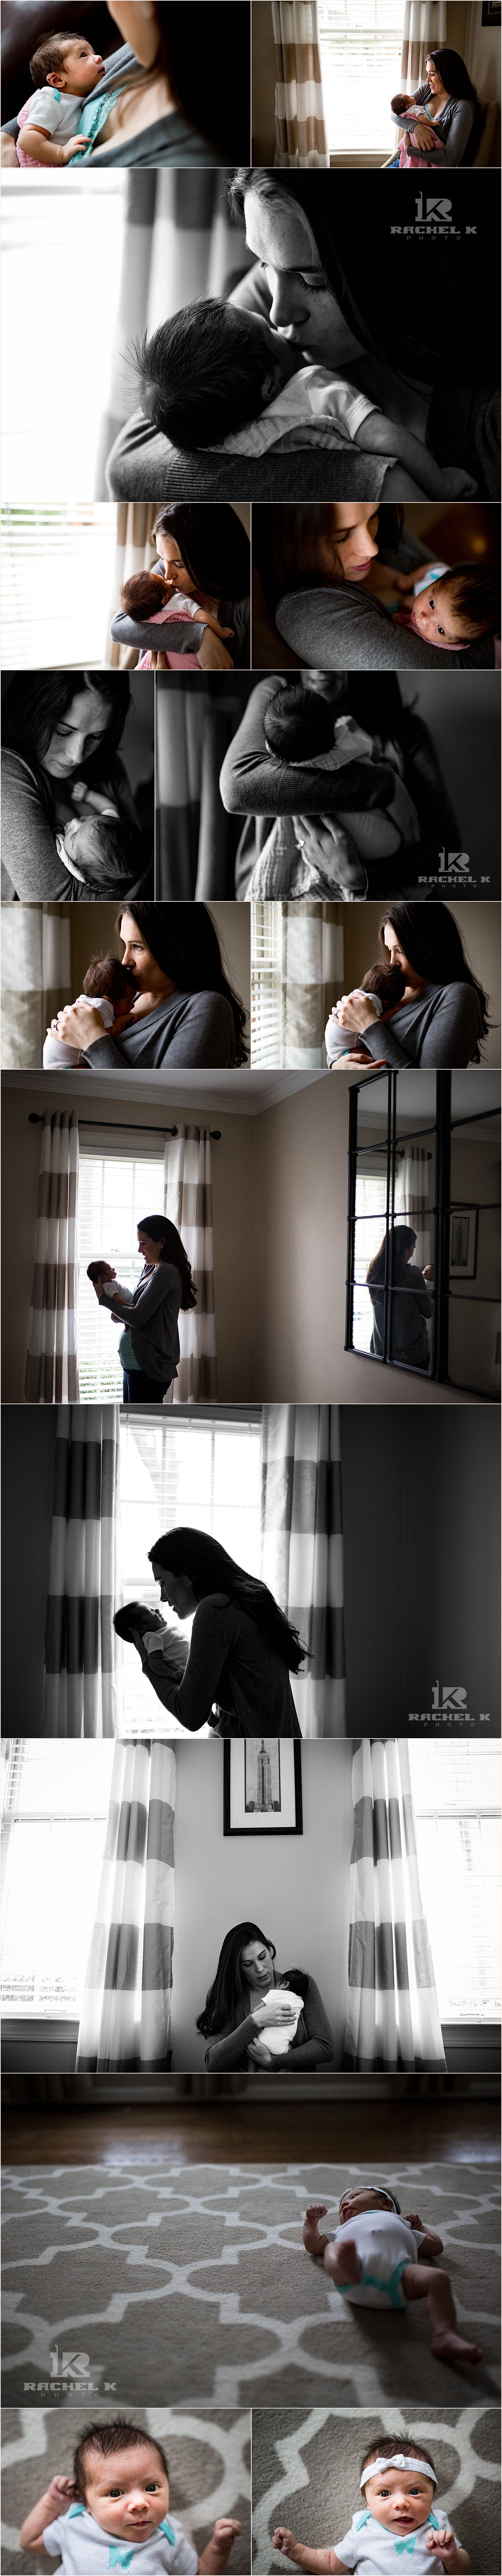 Newborn lifestyle photos by Rachel K Photo in Fairfax VA